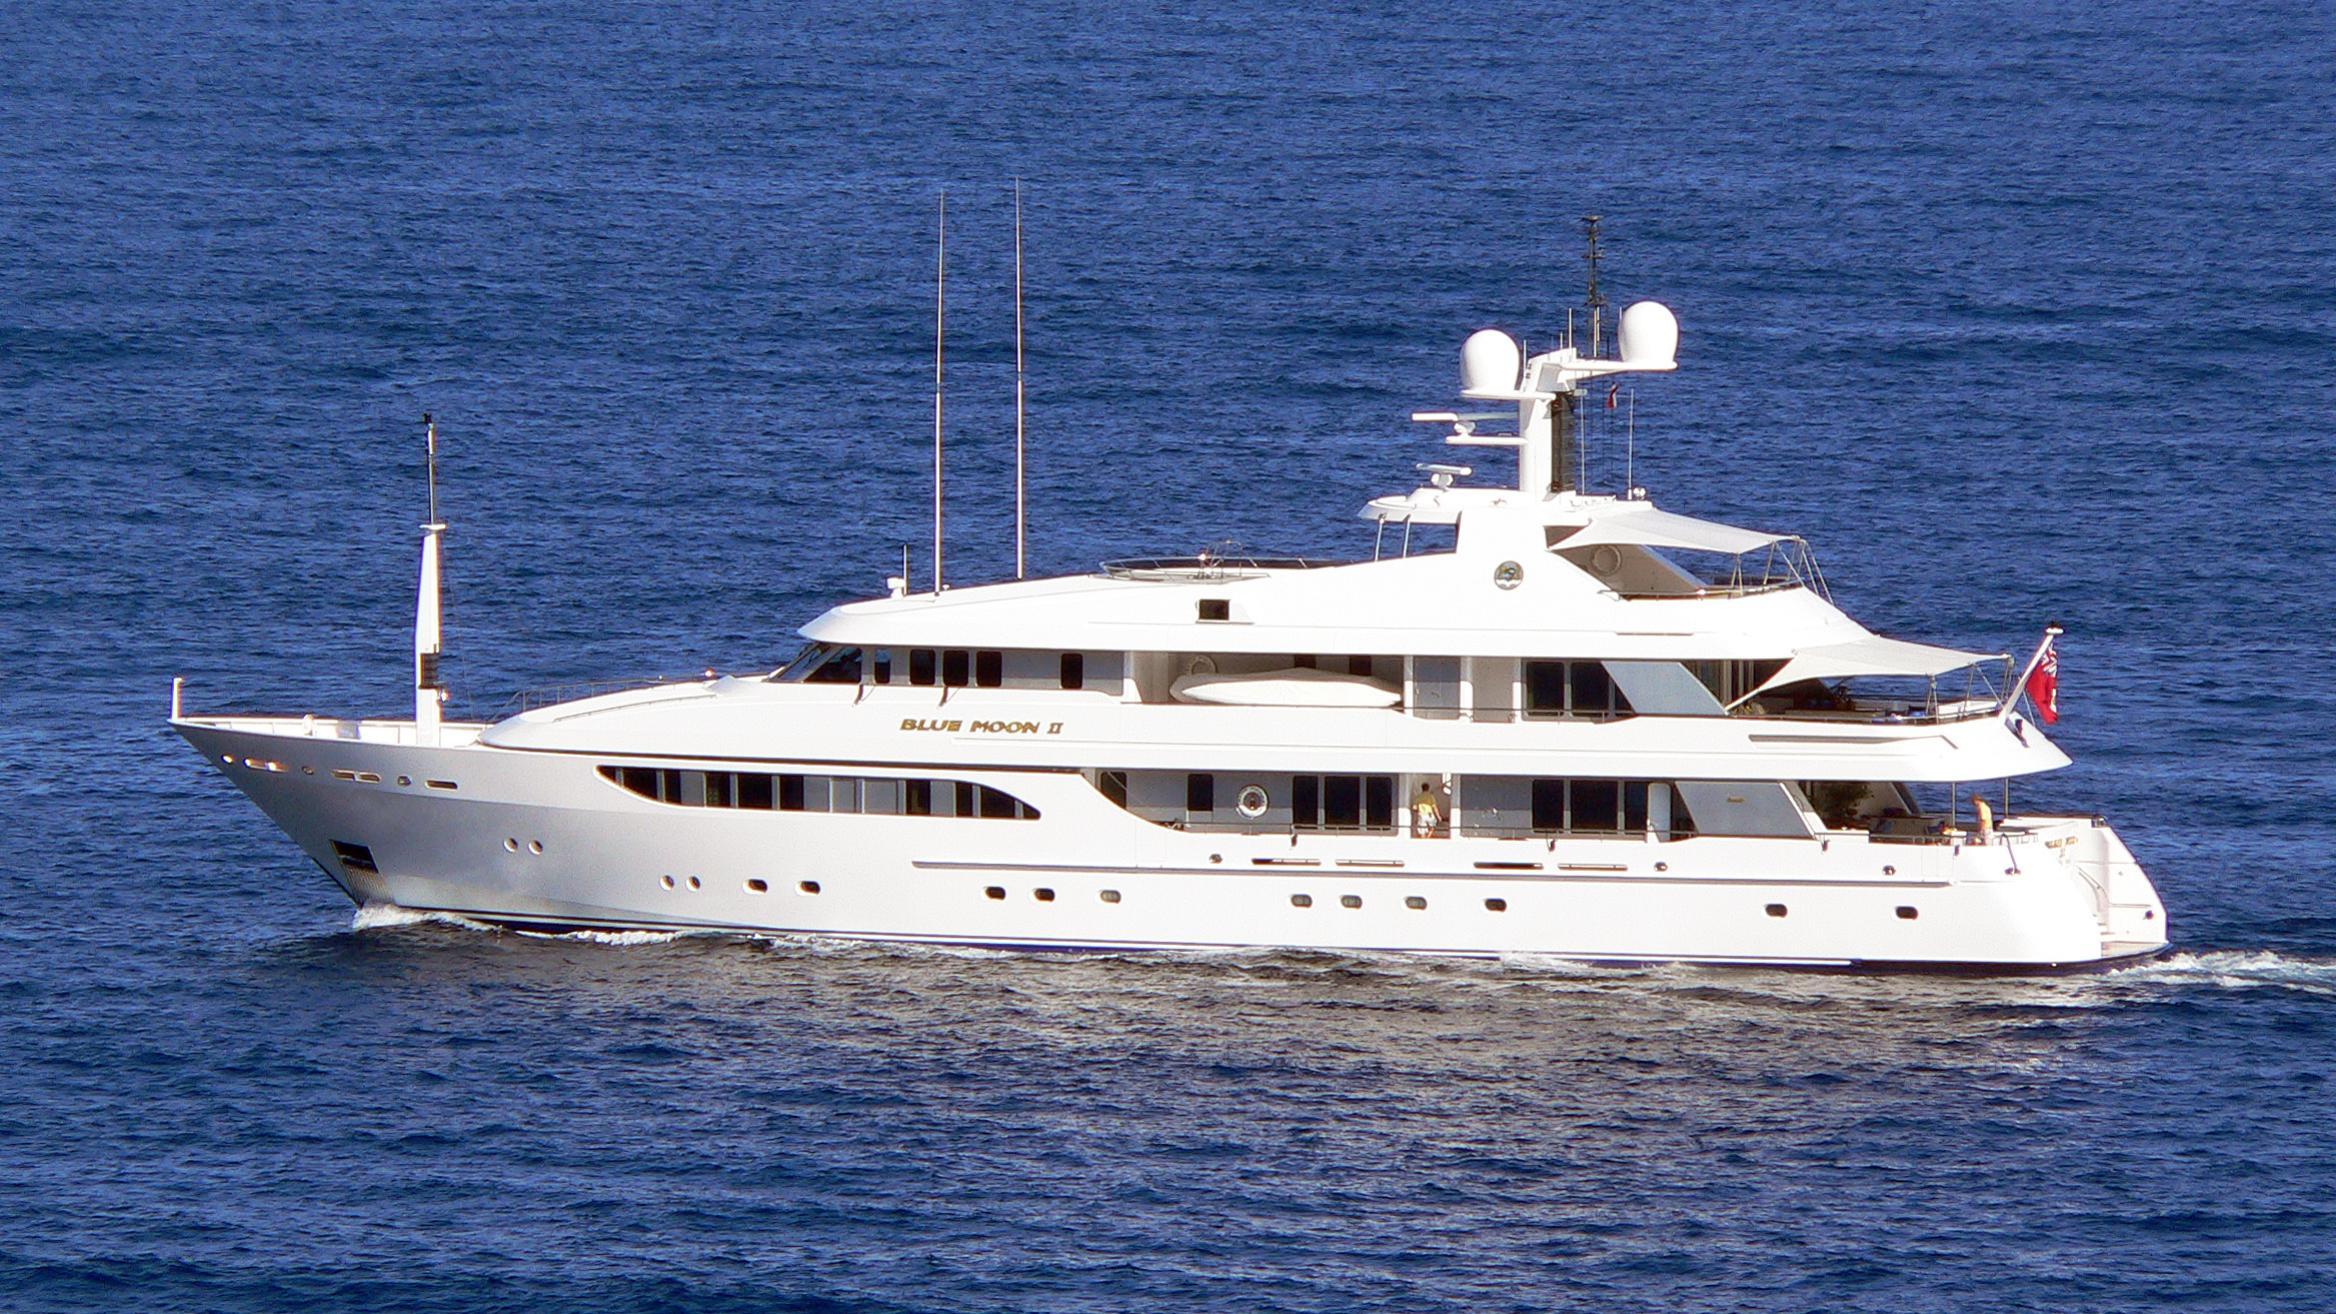 broadwater deja vu blue moon motoryacht feadship 50m 2000 profile